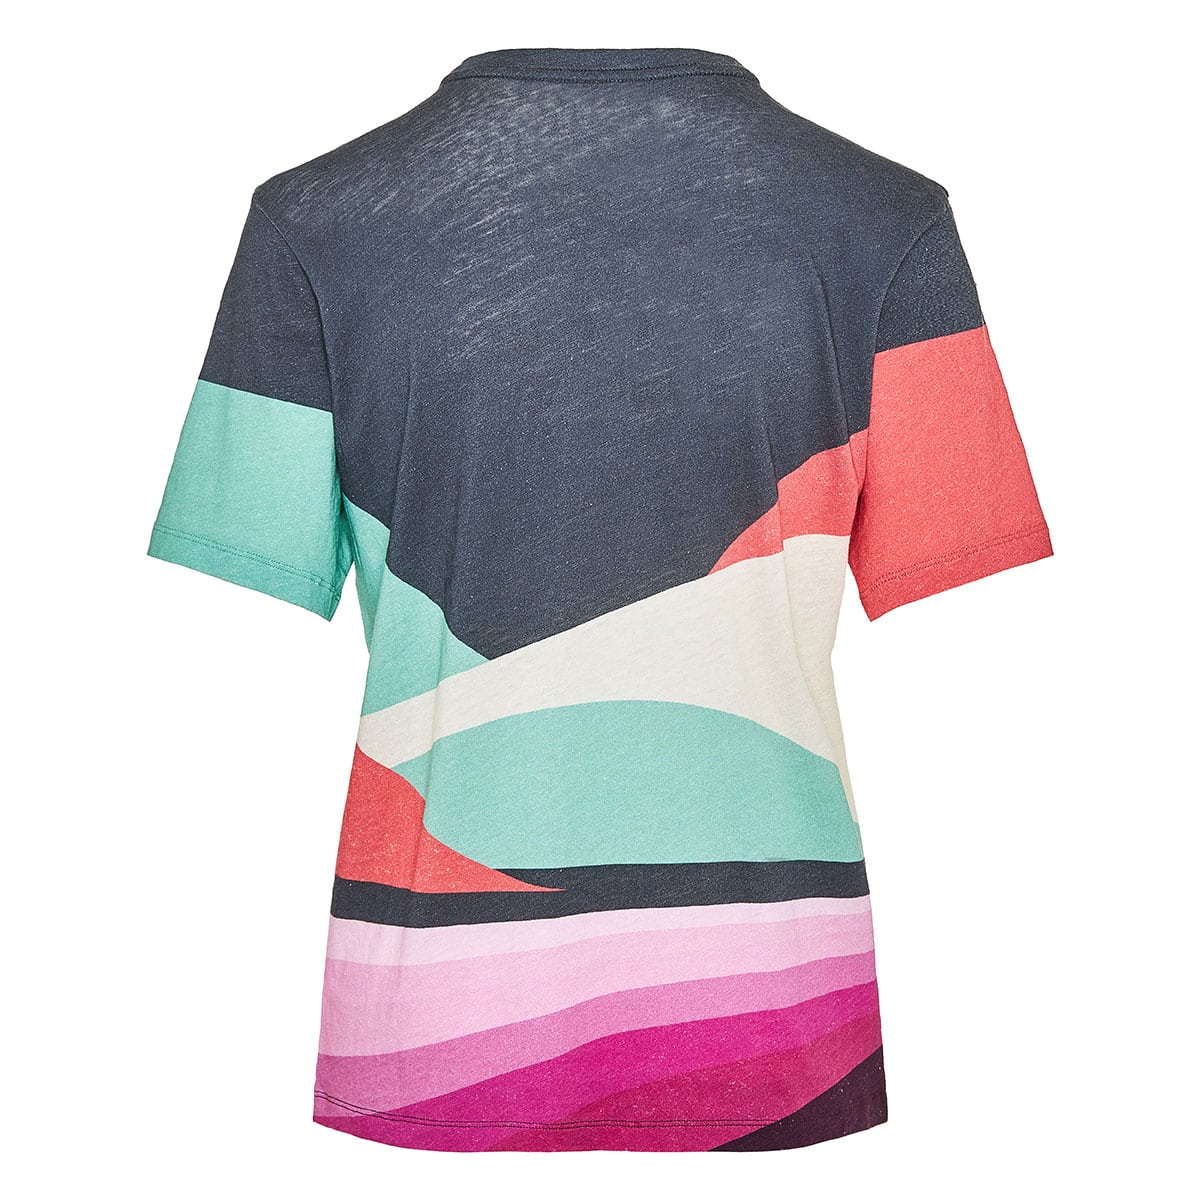 Zewel printed logo t-shirt